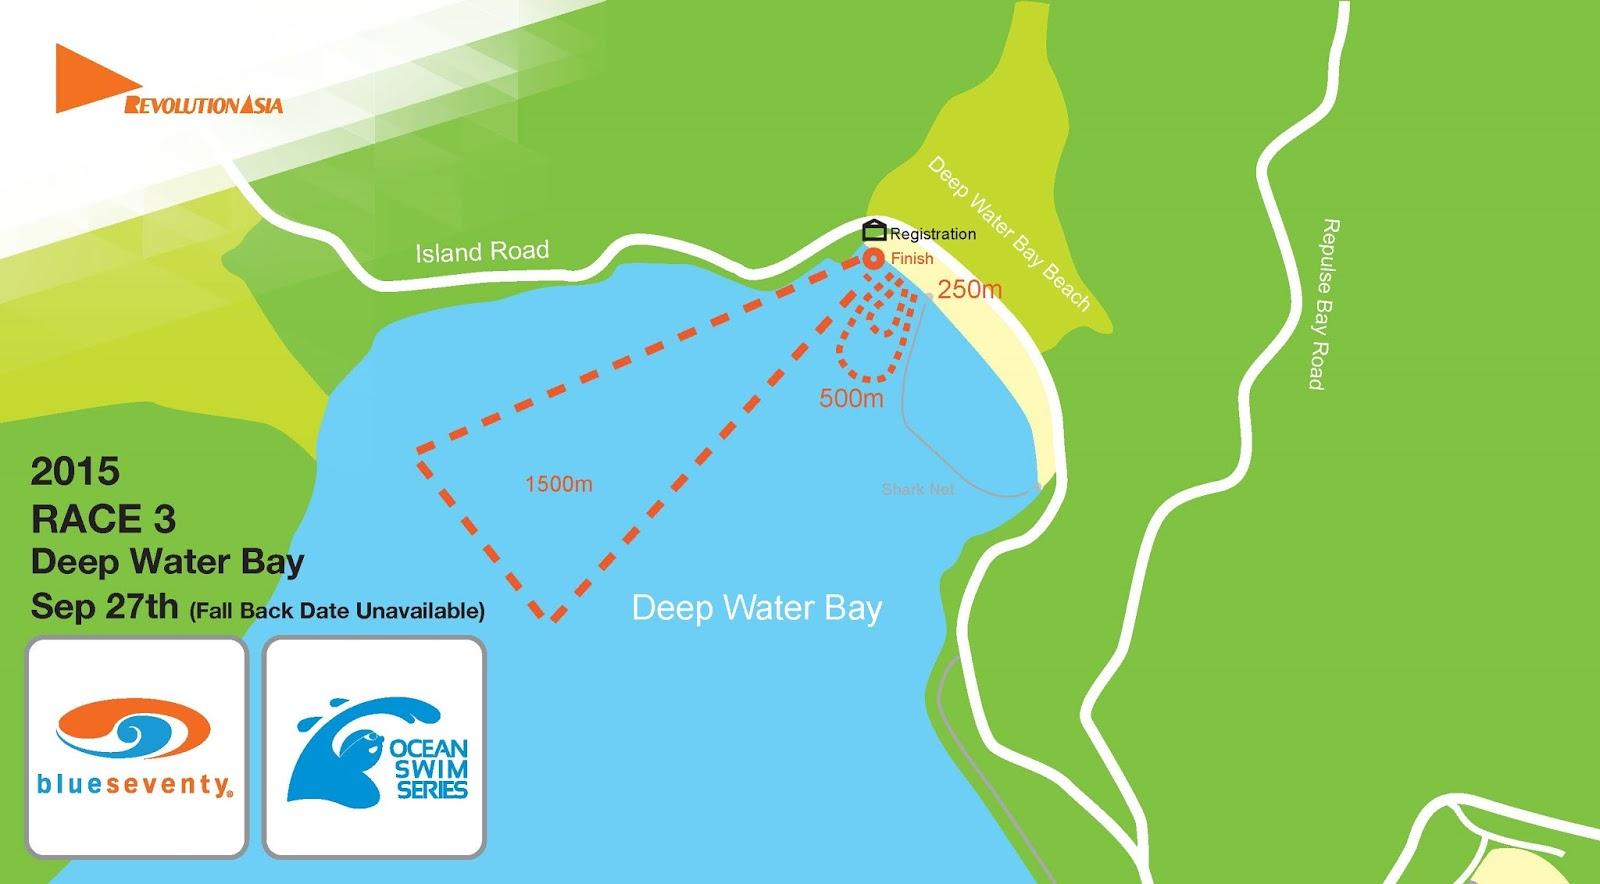 唯有跑者留其名: Revolution Asia Ocean Swim Series Race 3 - September 27 2015